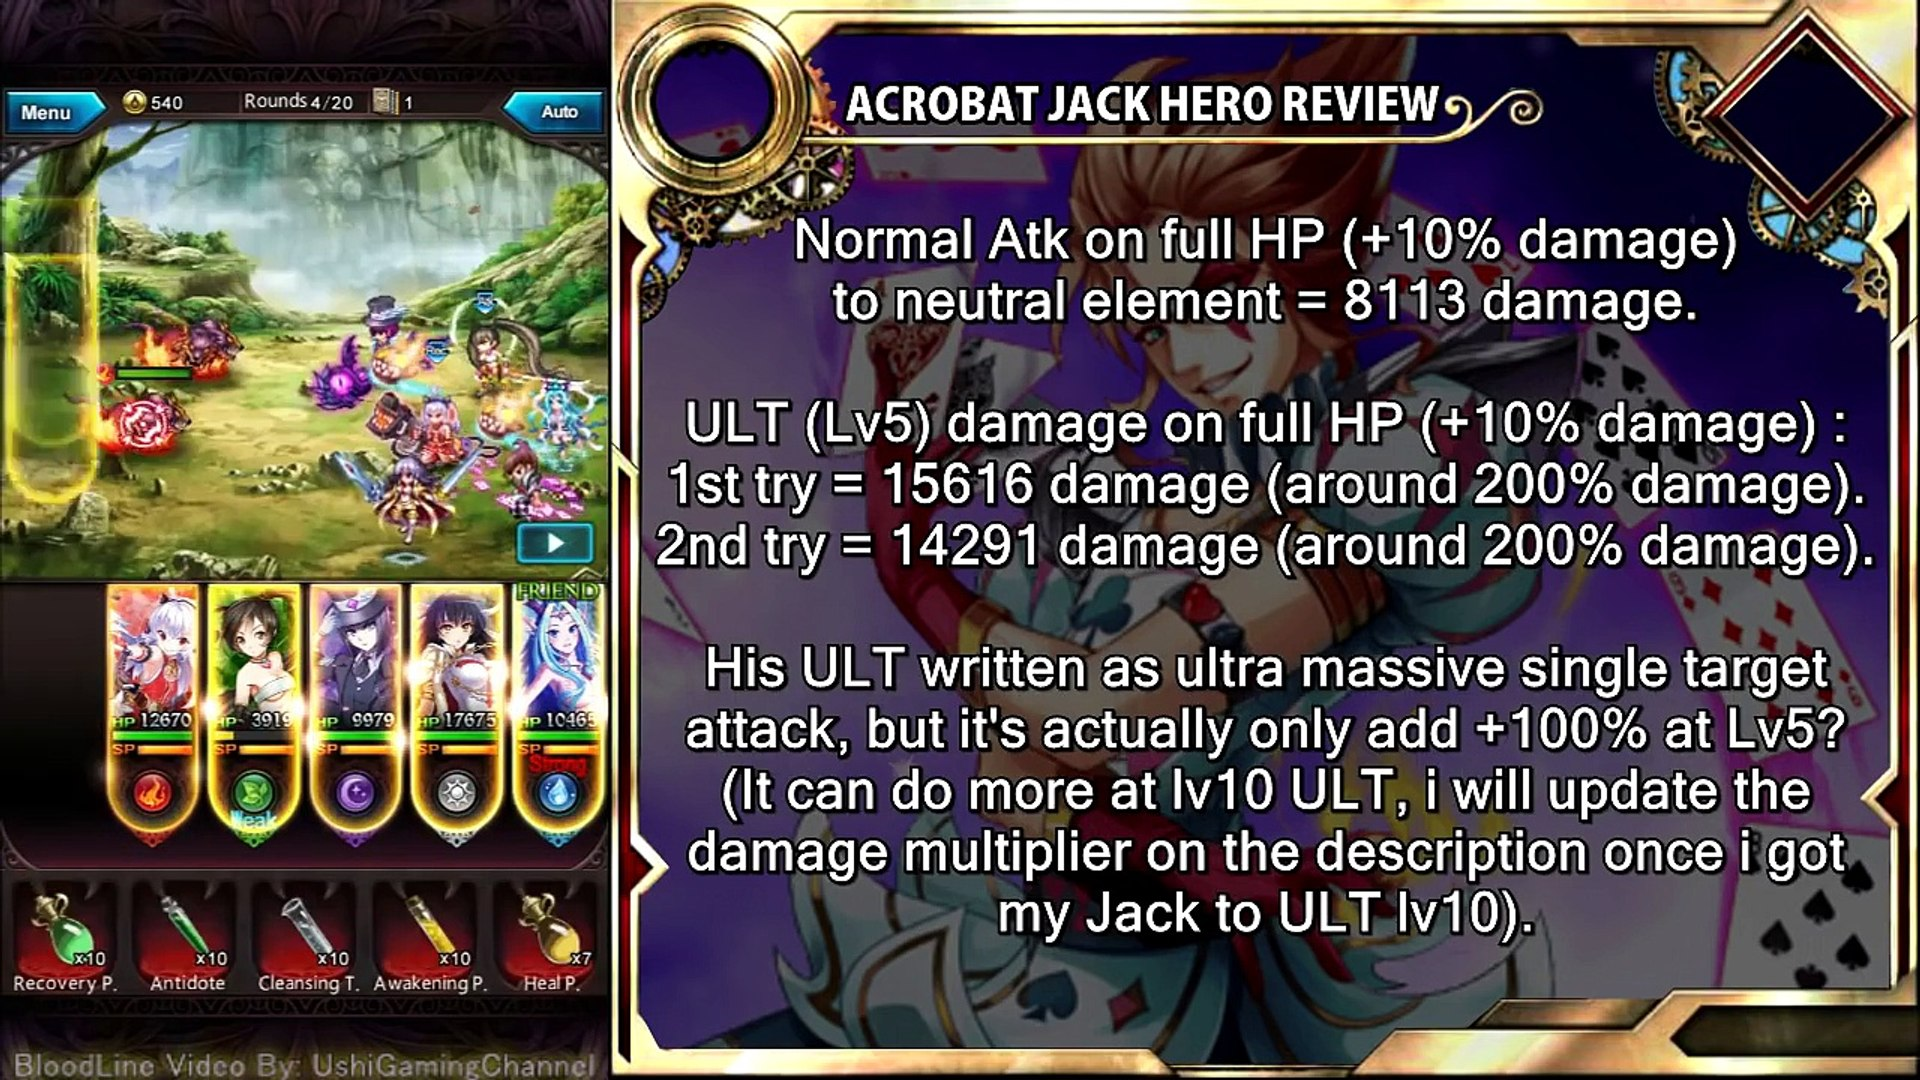 Acrobat Jack Hero Review (BloodLine)